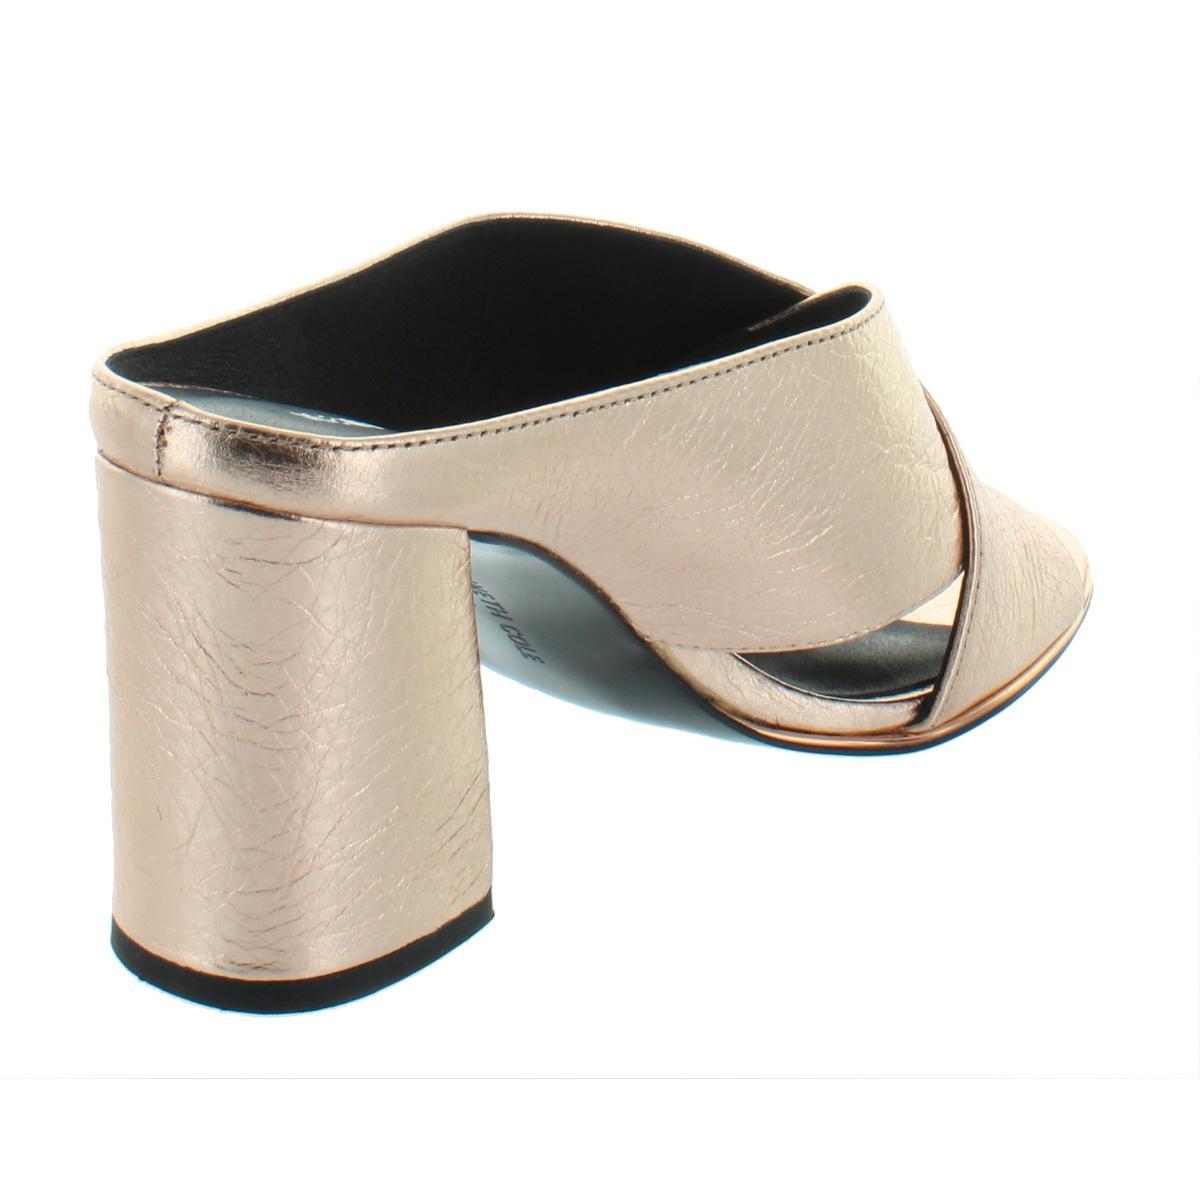 Kenneth Cole New York York York donna Lyra Heels Mules scarpe BHFO 6629 47a690